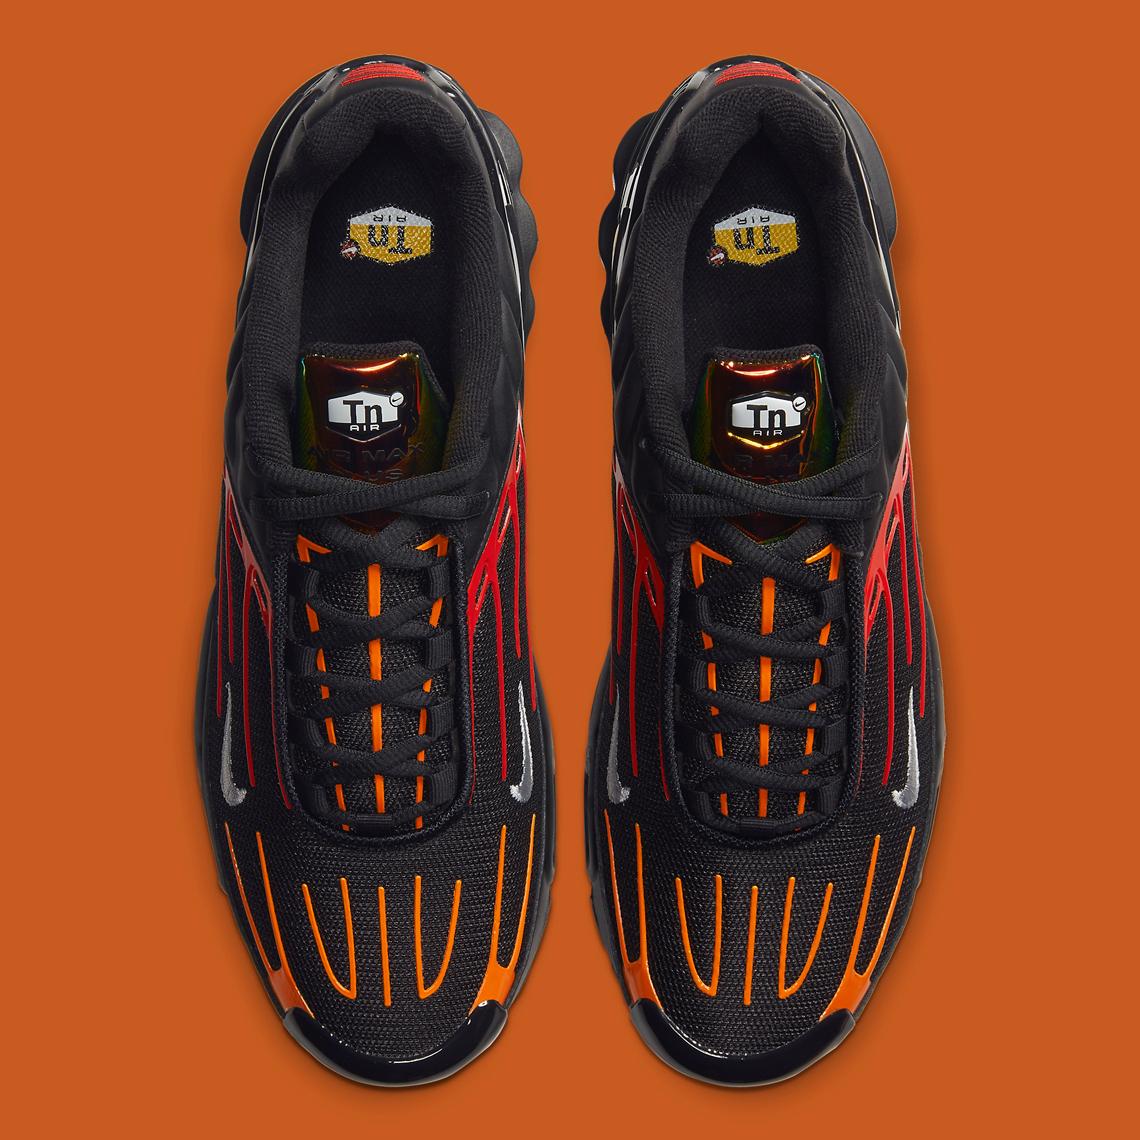 Nike Air Max Plus 3 Black Orange Red CV1643 001 Release Date